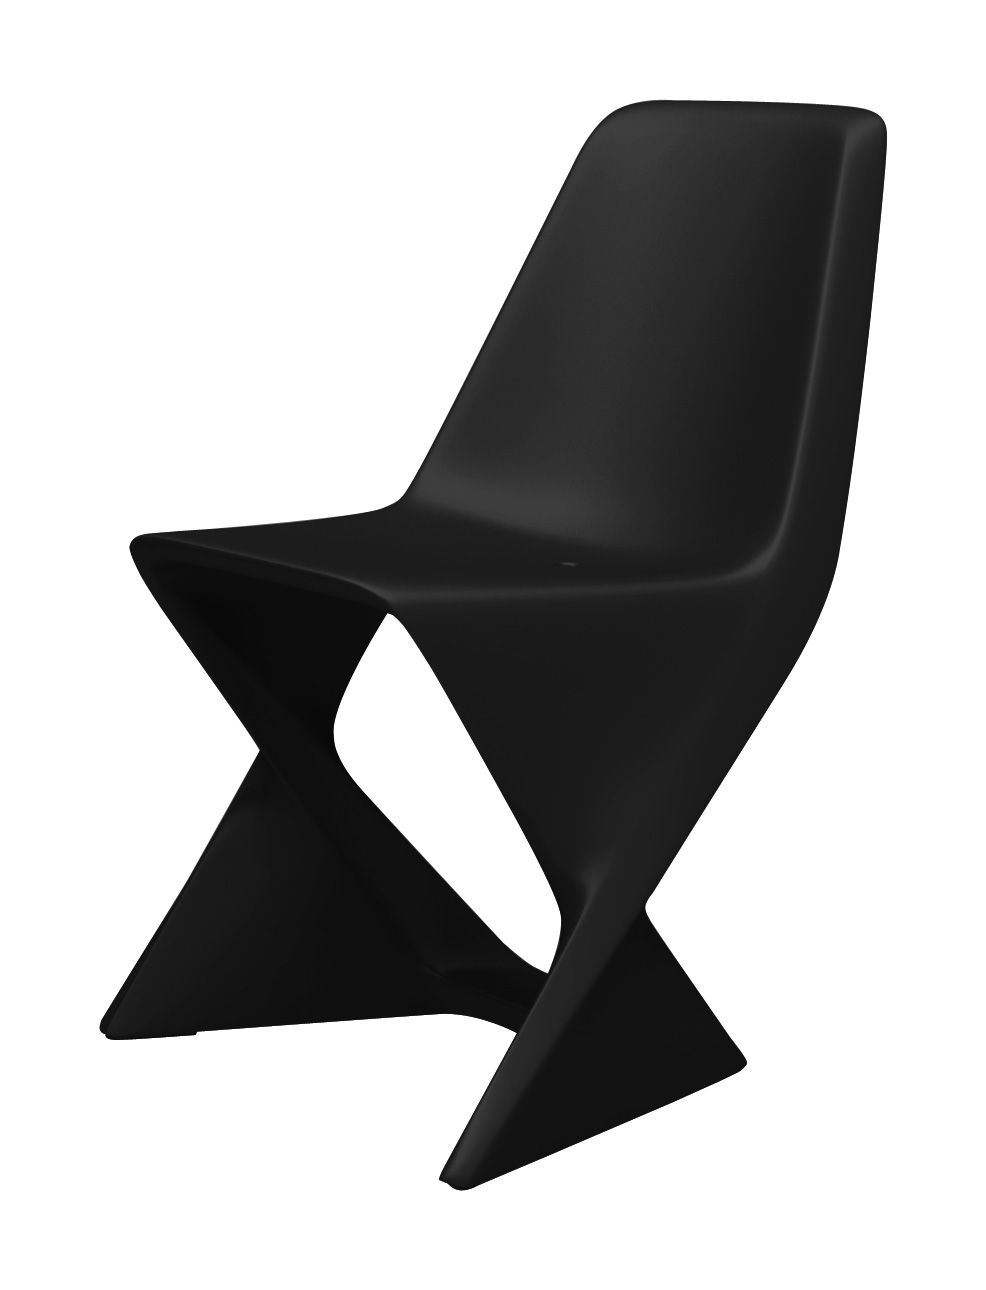 Chaise Iso Noir - Qui est Paul ? | Made In Design